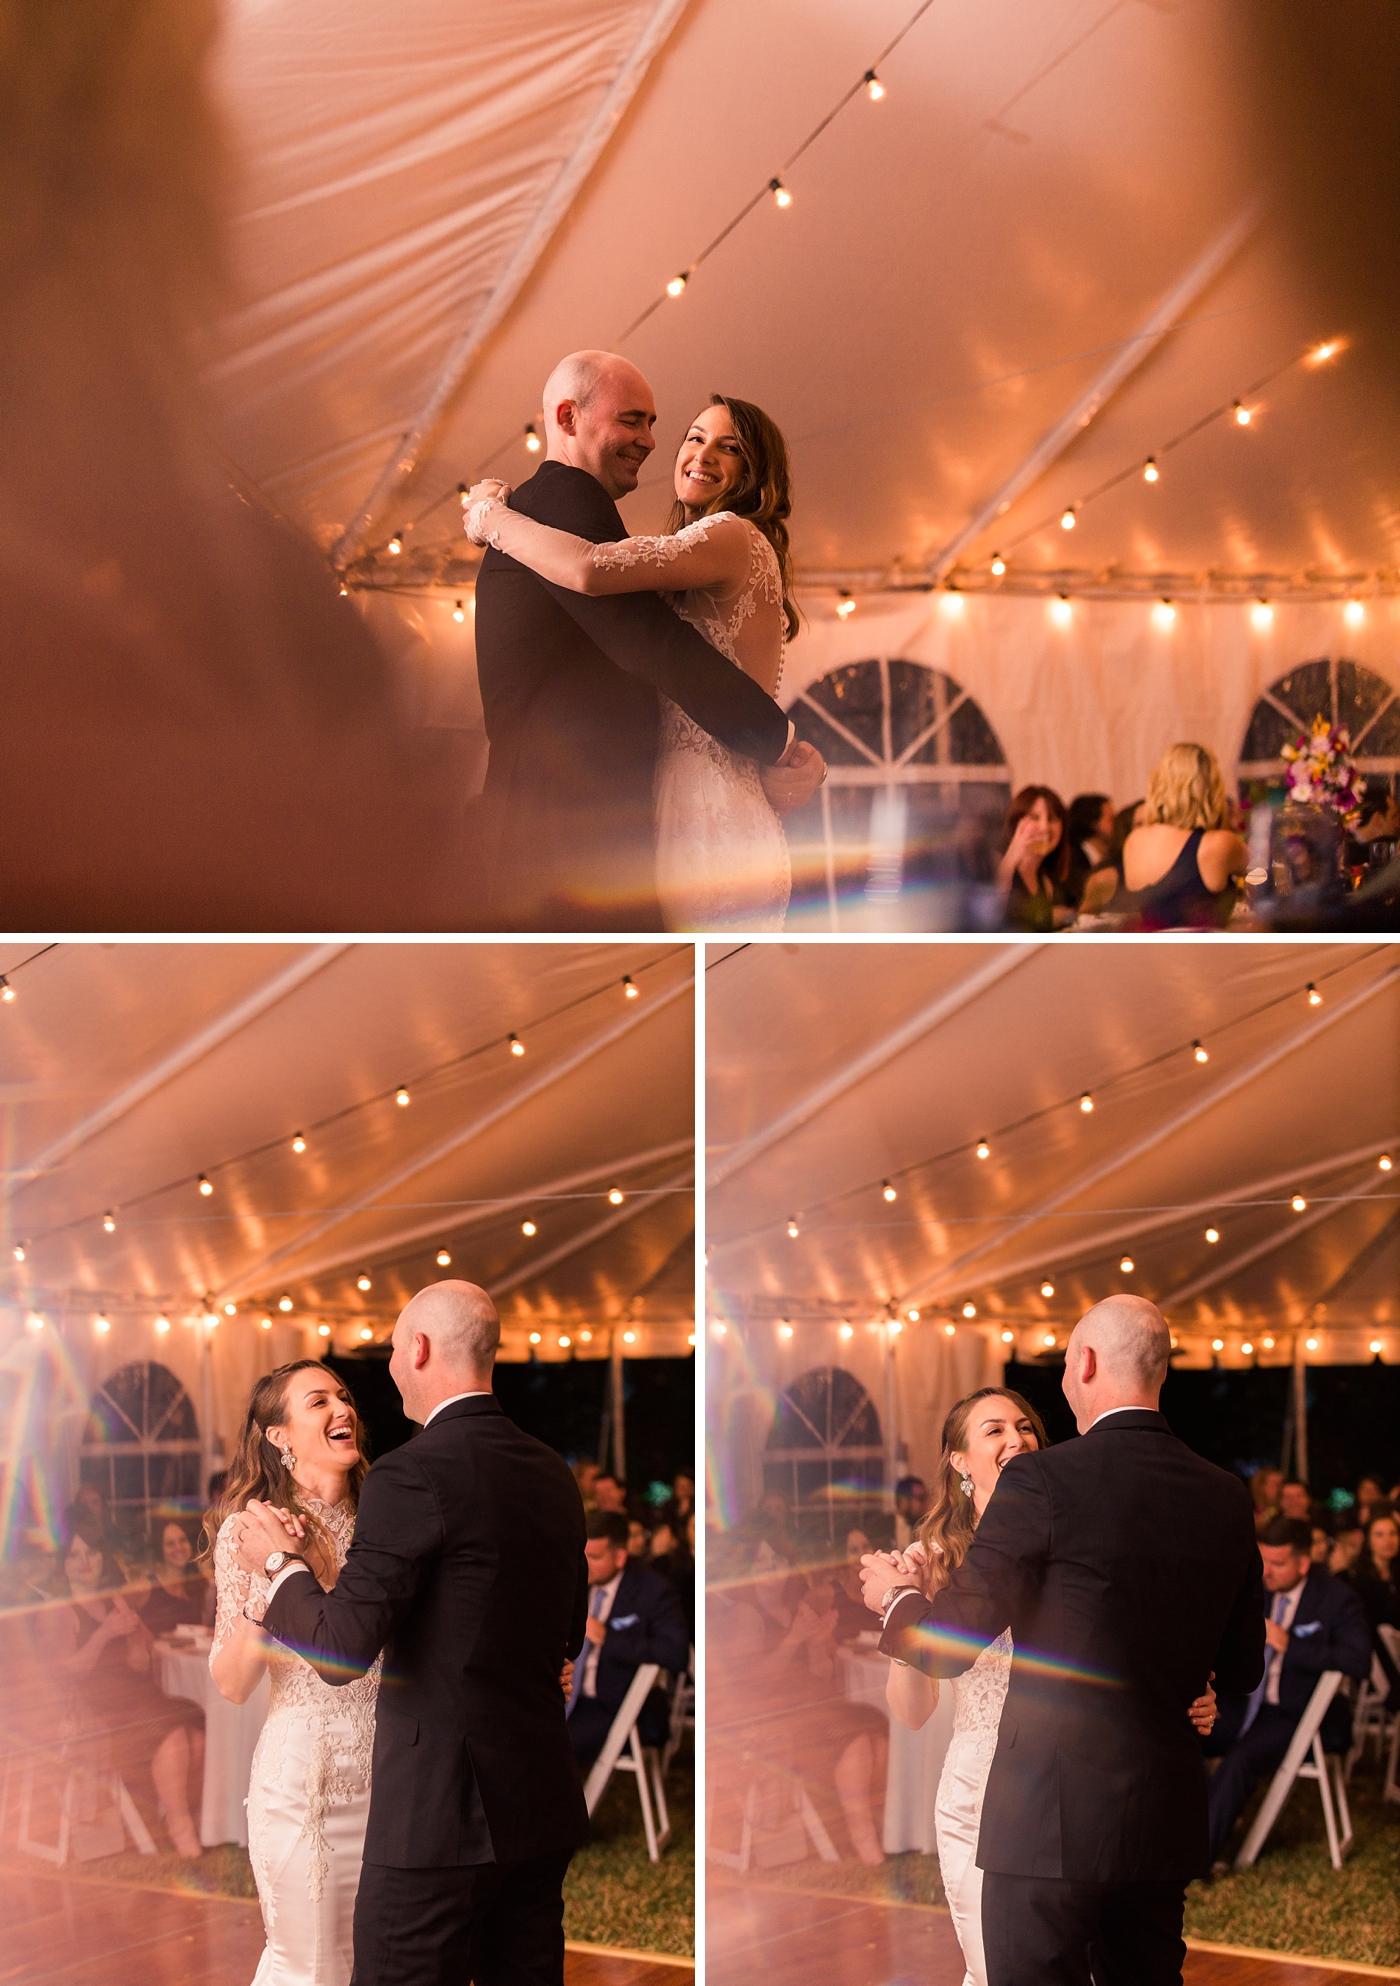 orlando-wedding-photography-justin-gilbert-tampa-sunken-gardens_0013.jpg